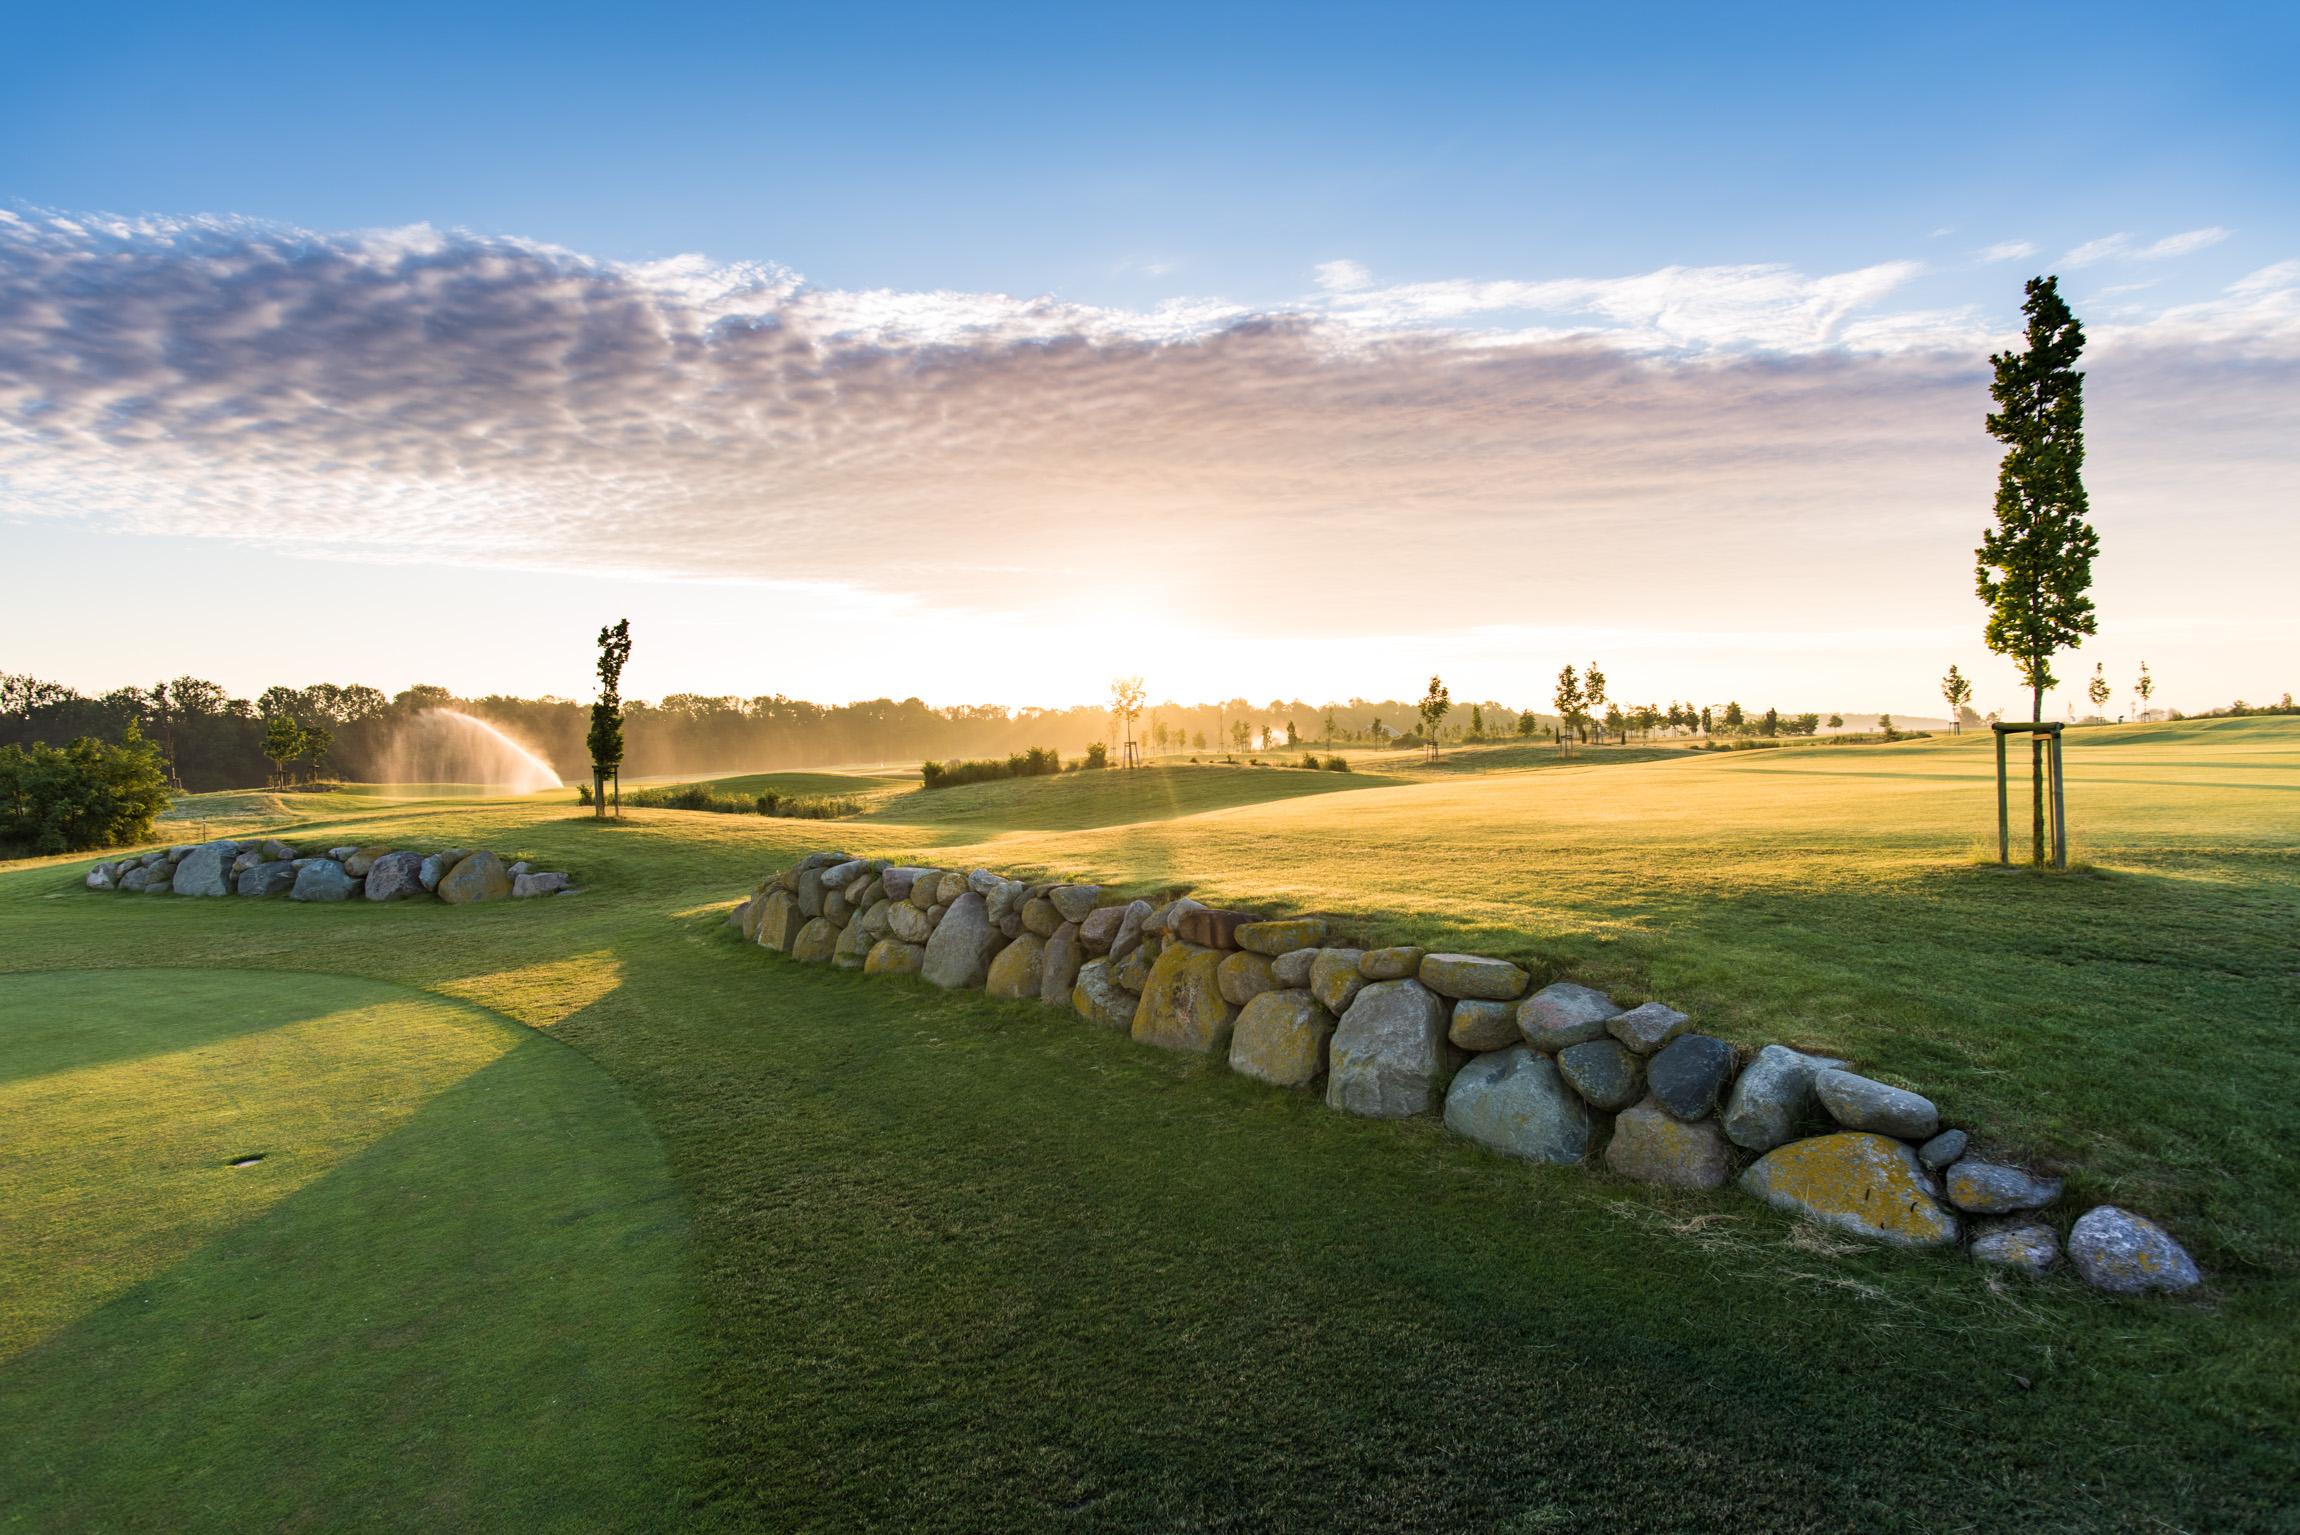 Strelasund golfbana 4